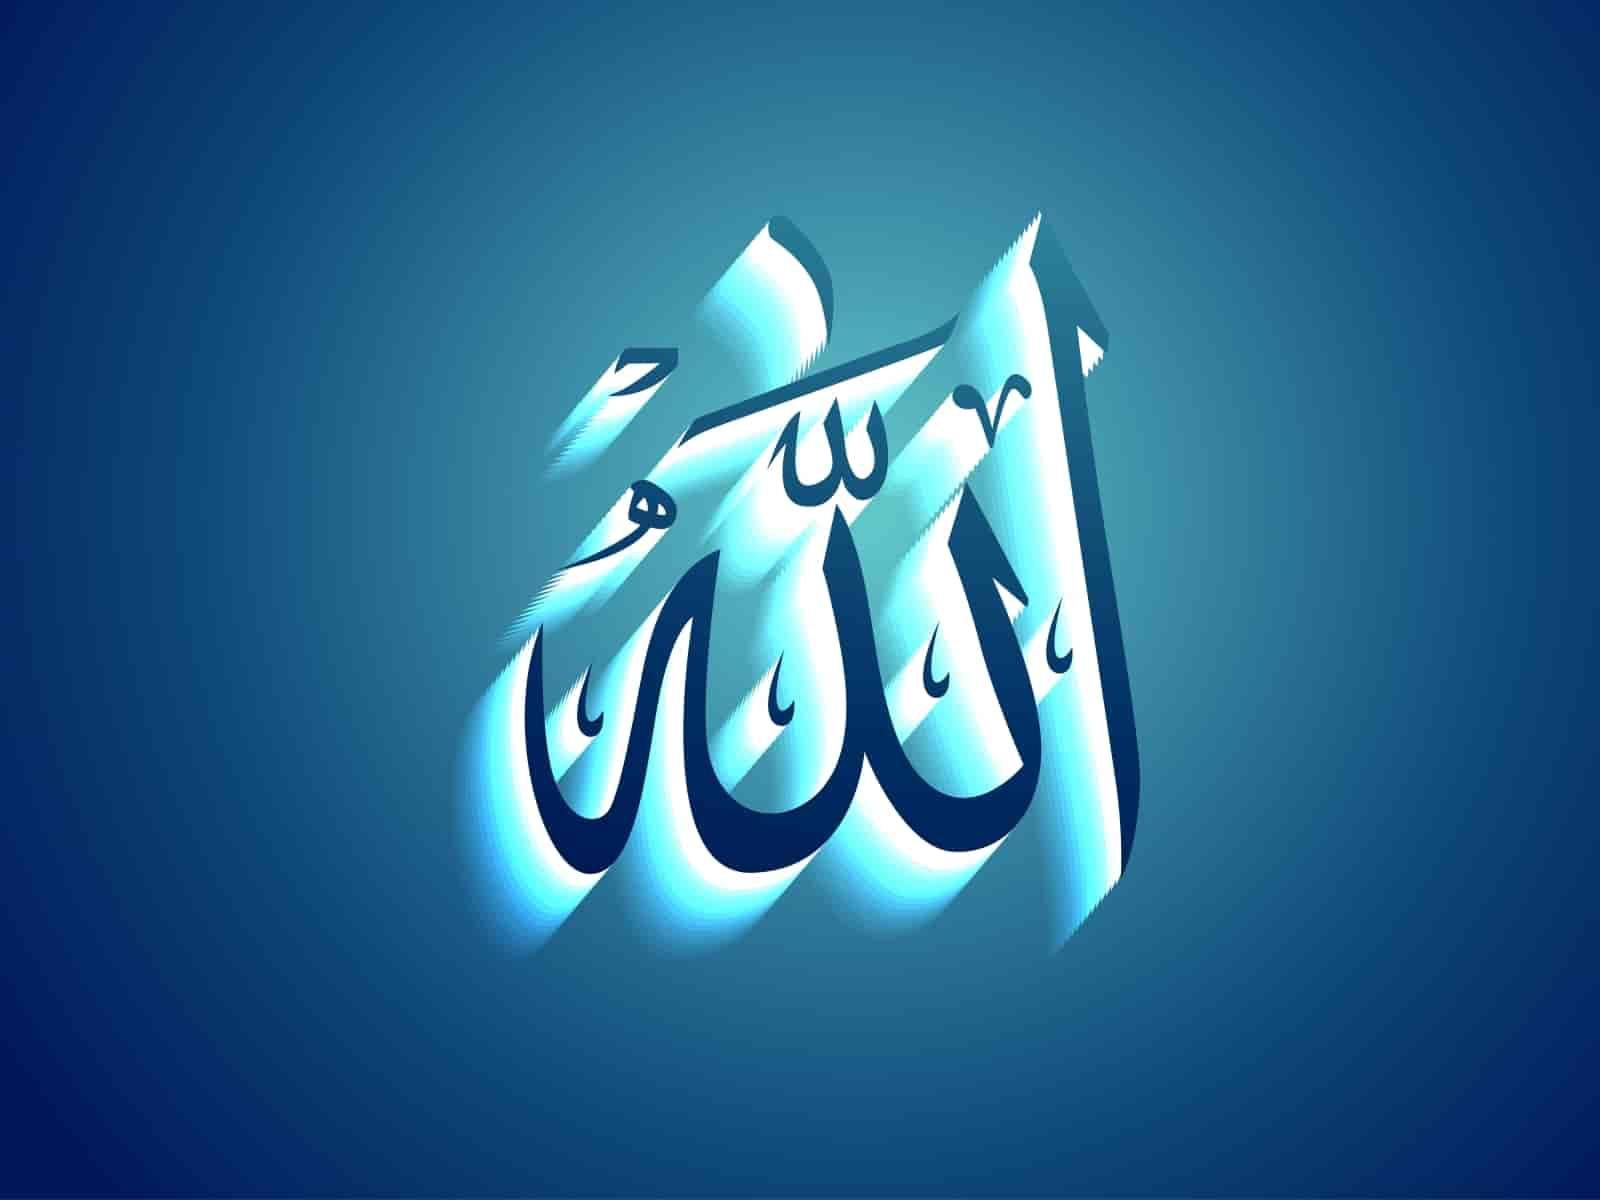 Da li je imenica Allah muškog roda Akaid El-Kelimeh blog.kelimeh.org Islamske teme islamski odgovori islamska pitanja